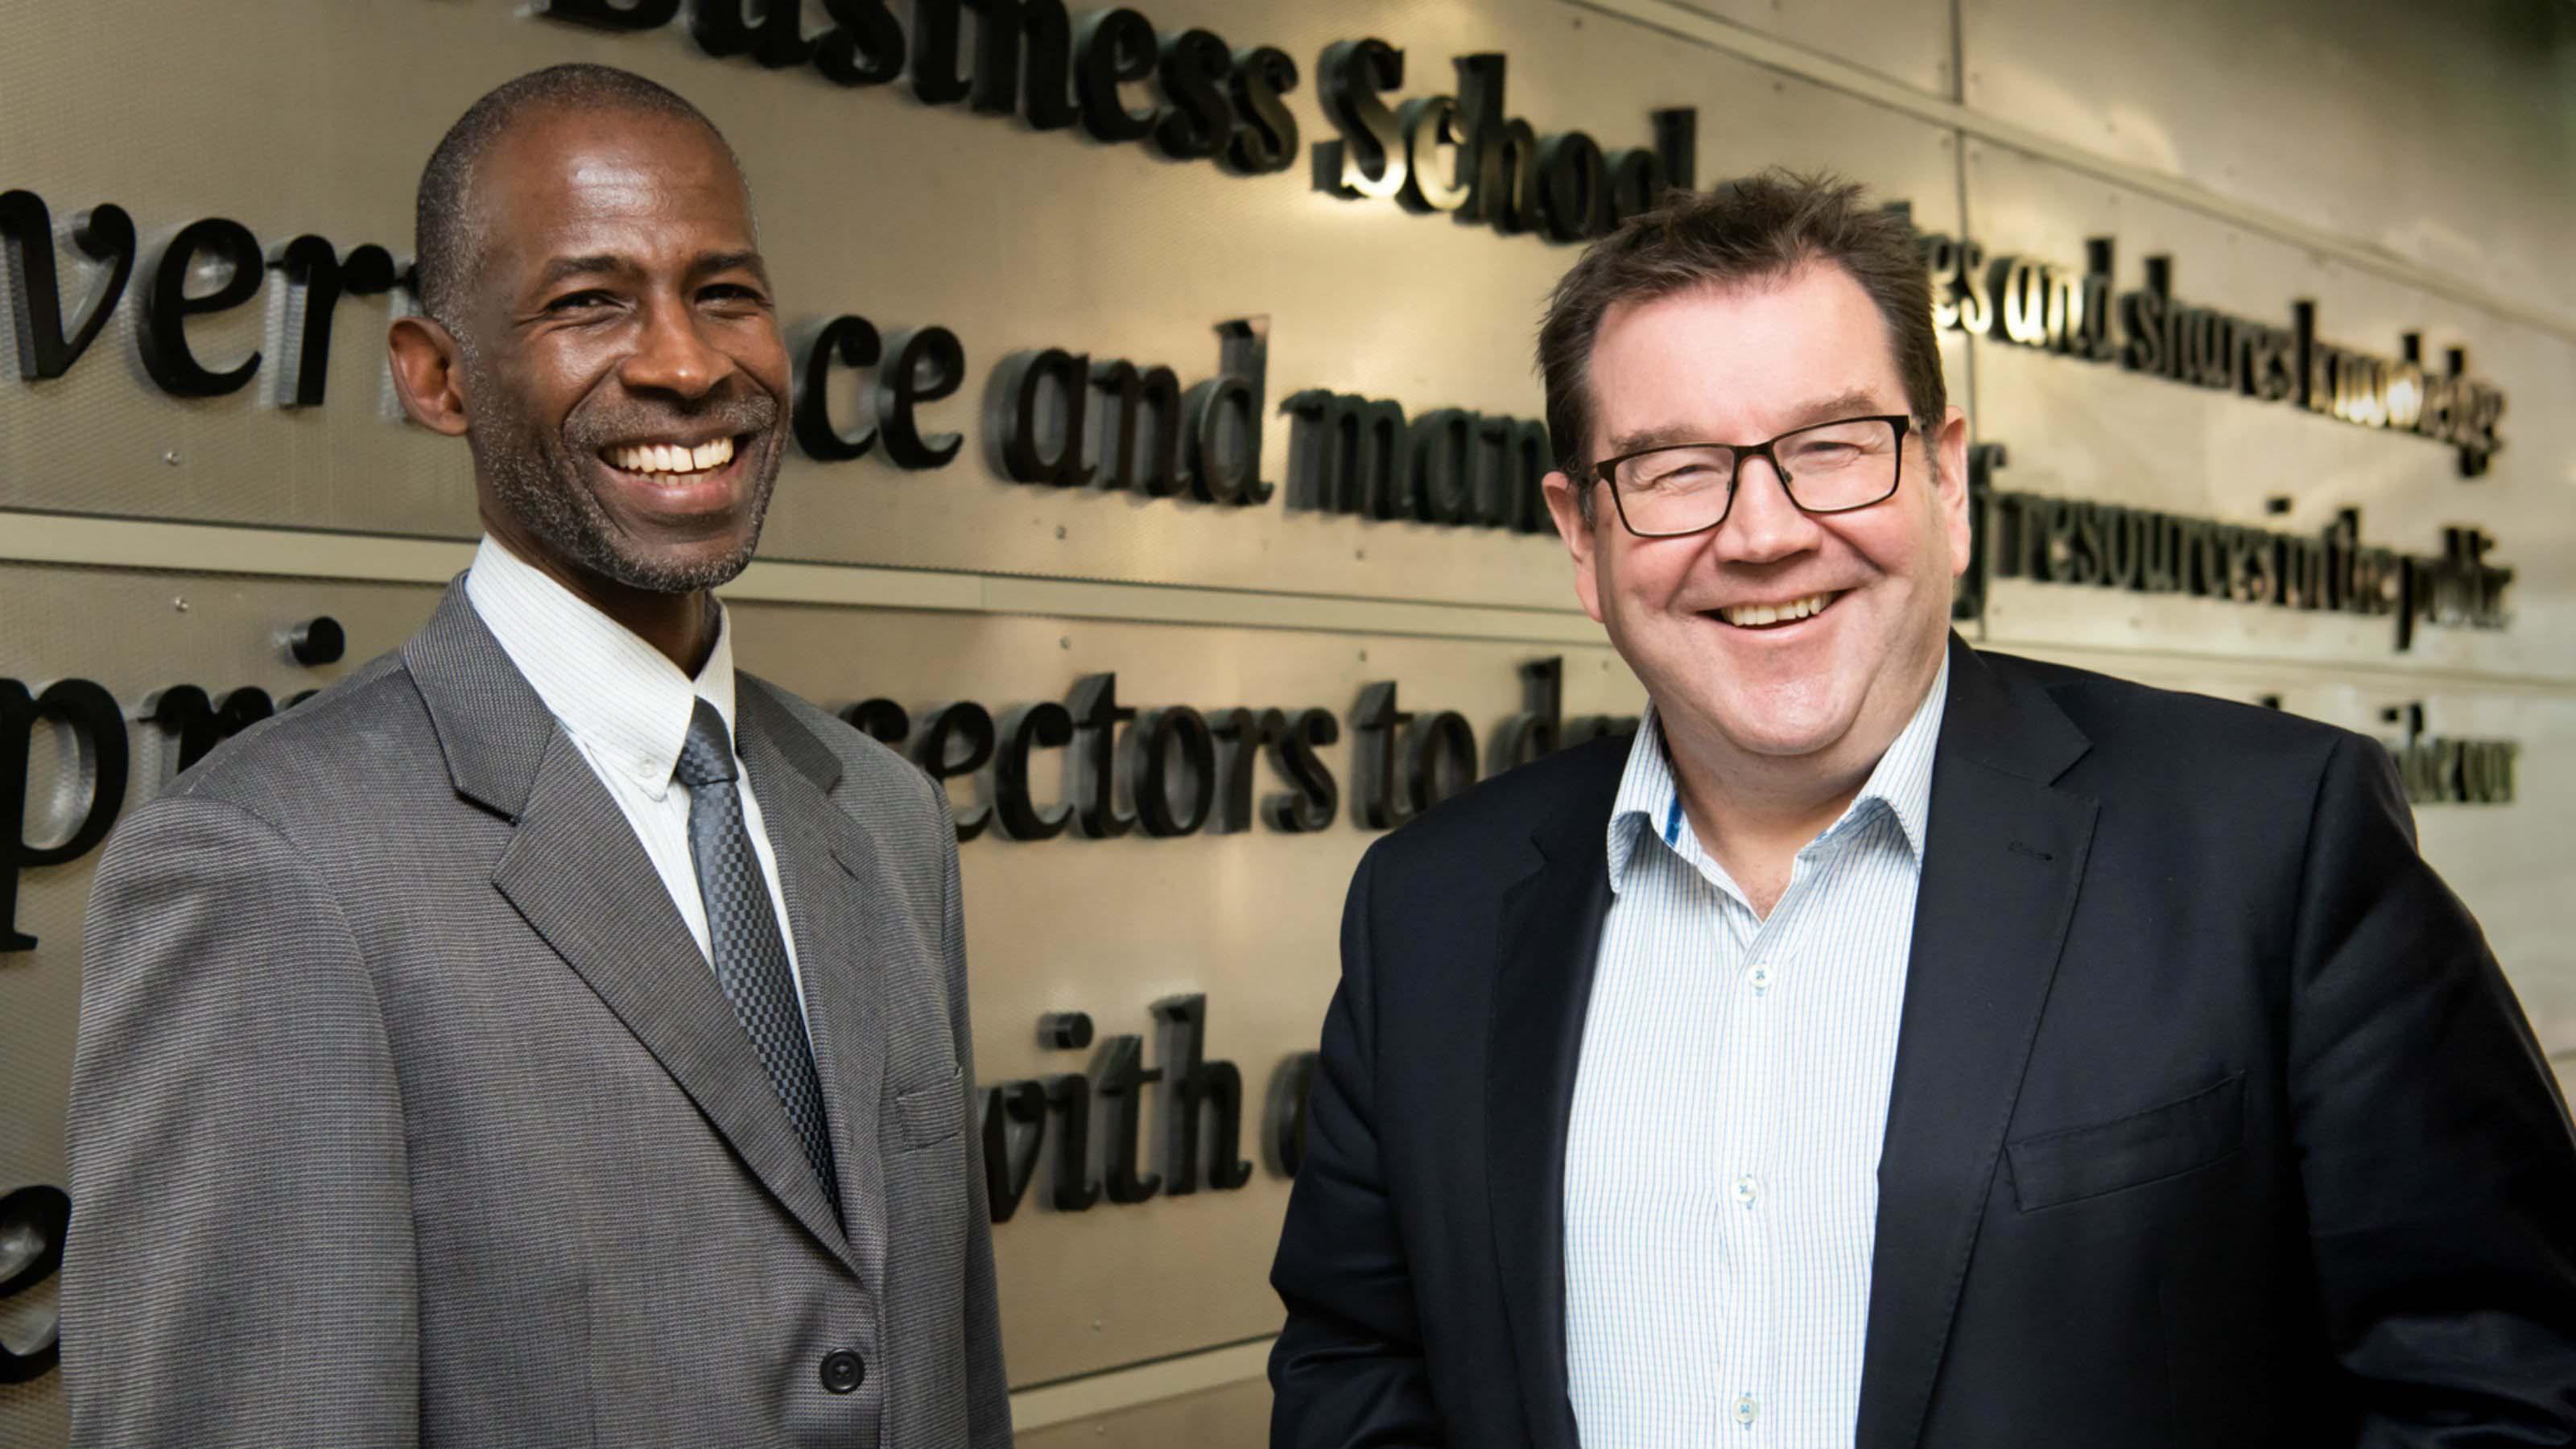 Professor Ian Williamson and Hon Grant Robertson